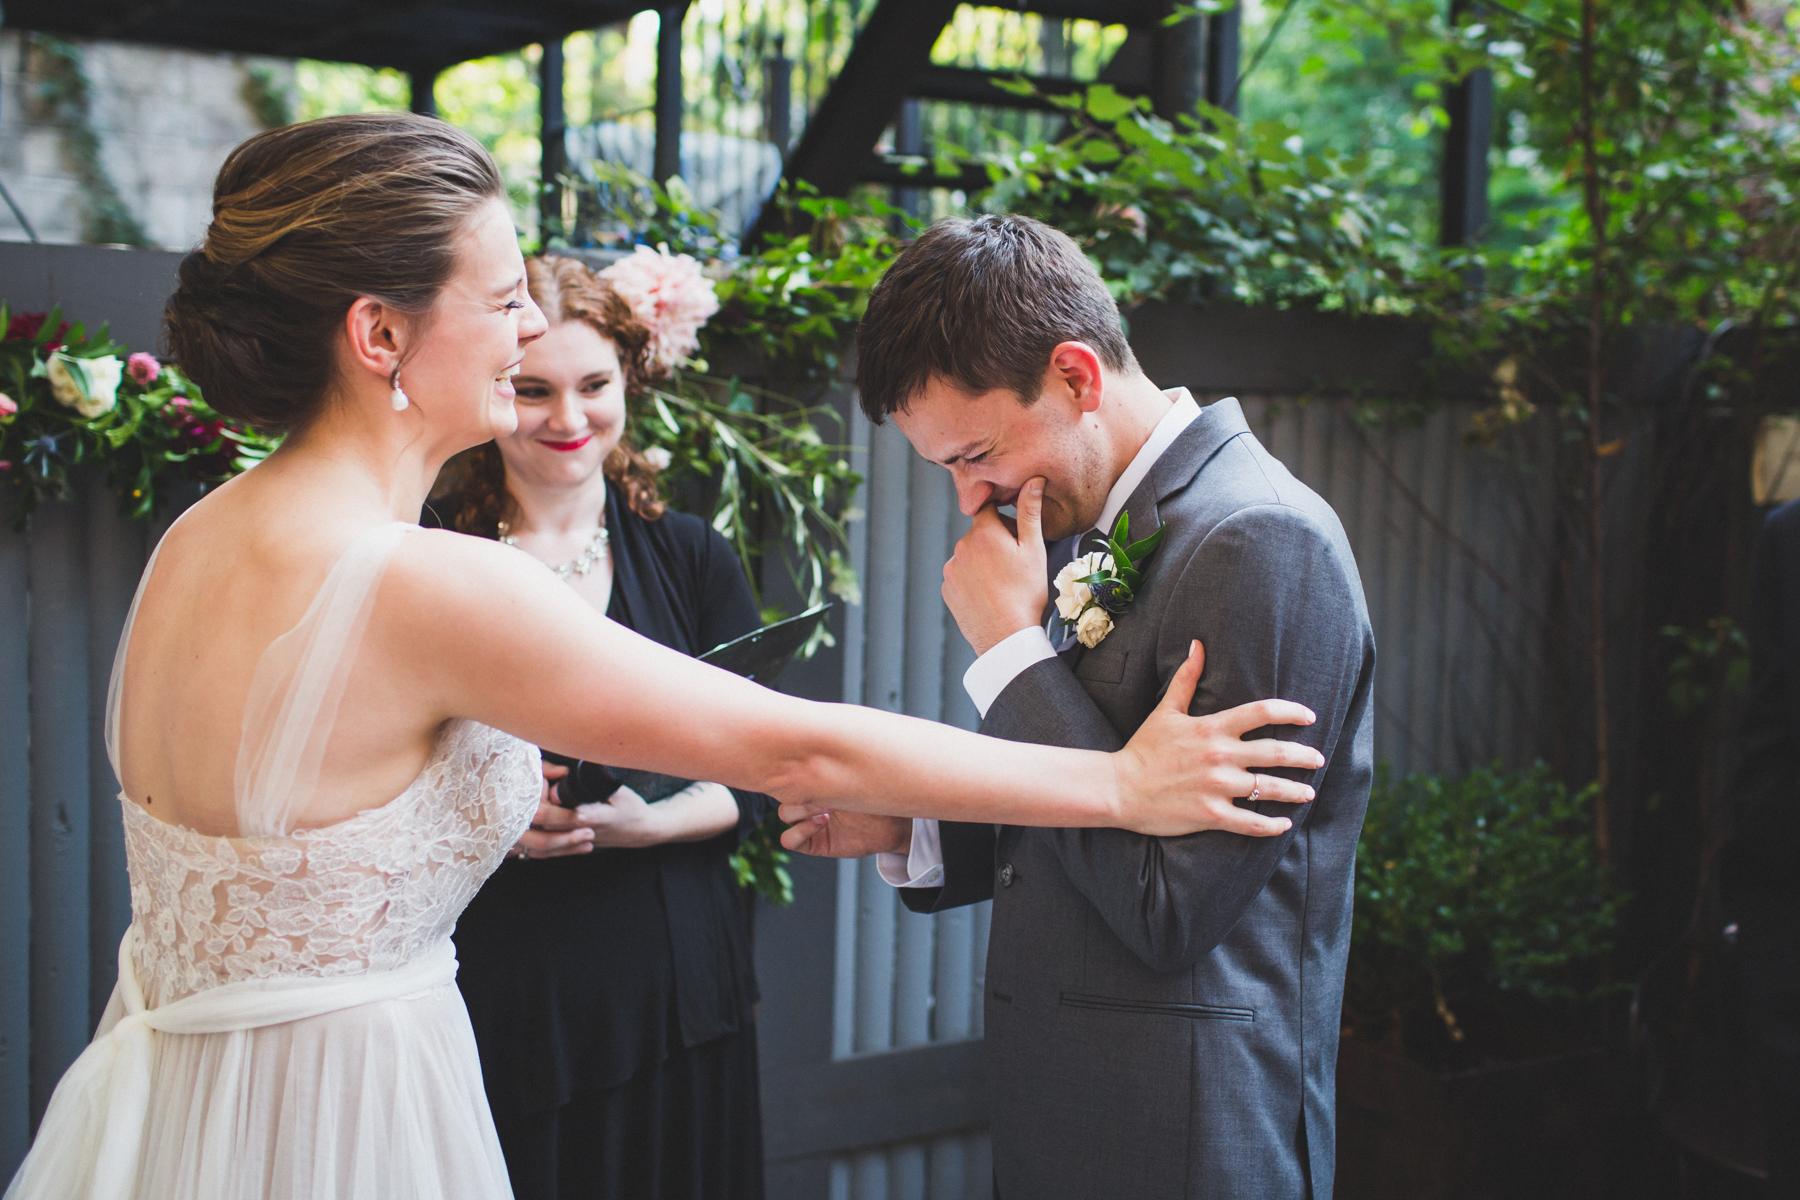 ICI-Restaurant-Fort-Greene-Brooklyn-Intimate-Documentary-Wedding-Photography-Elvira-Kalviste-40.jpg